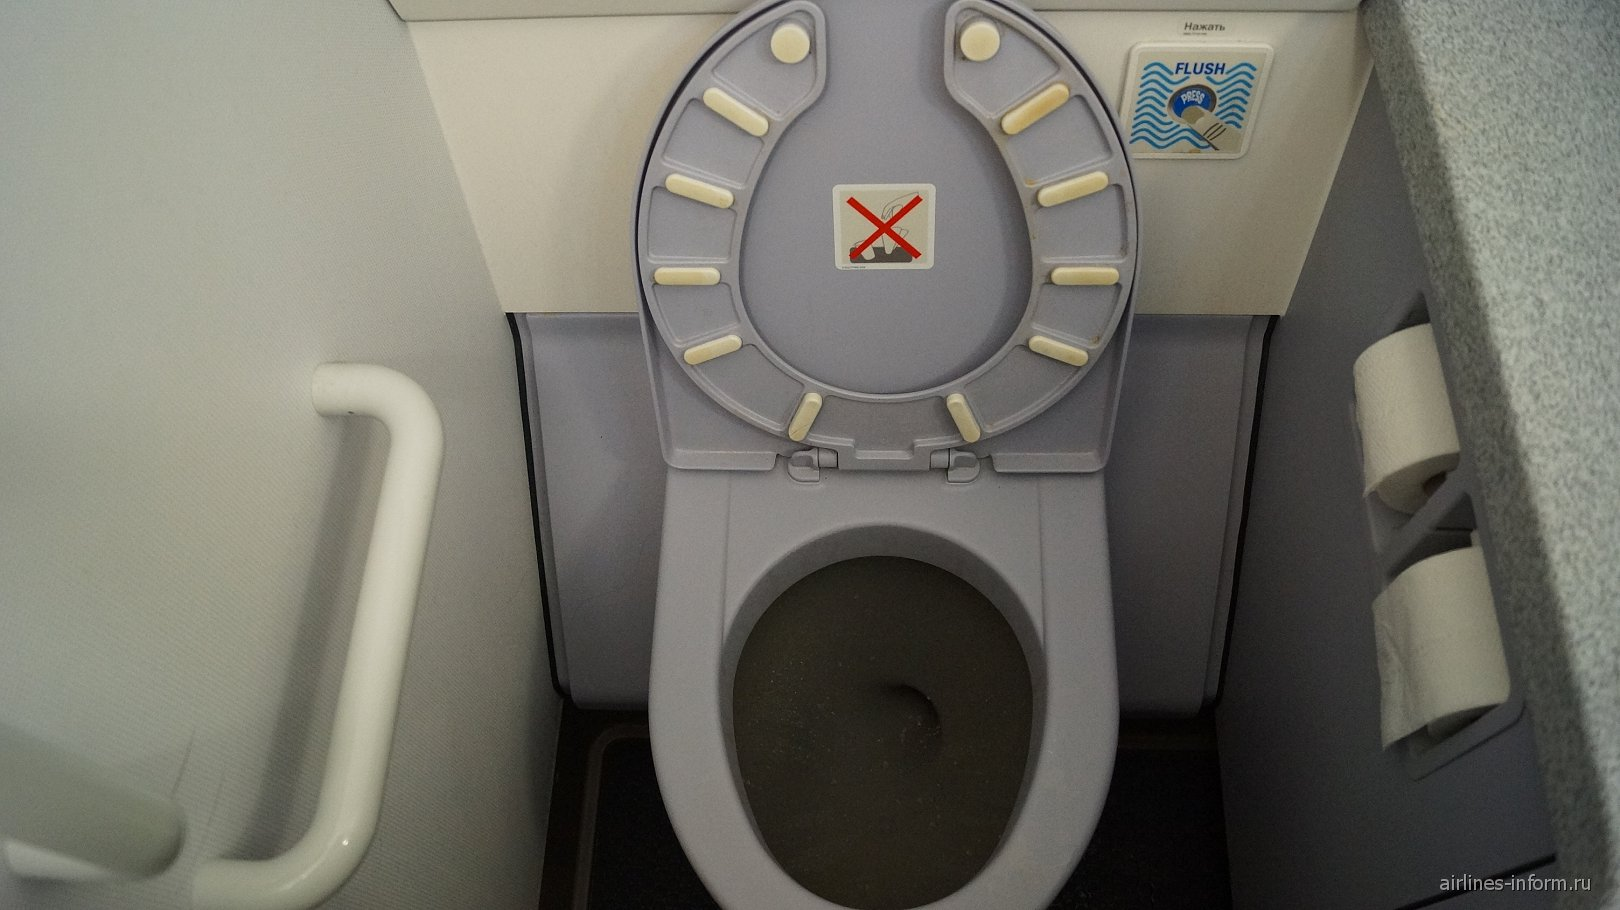 Туалет самолета Airbus A320 авиакомпании Аэрофлот